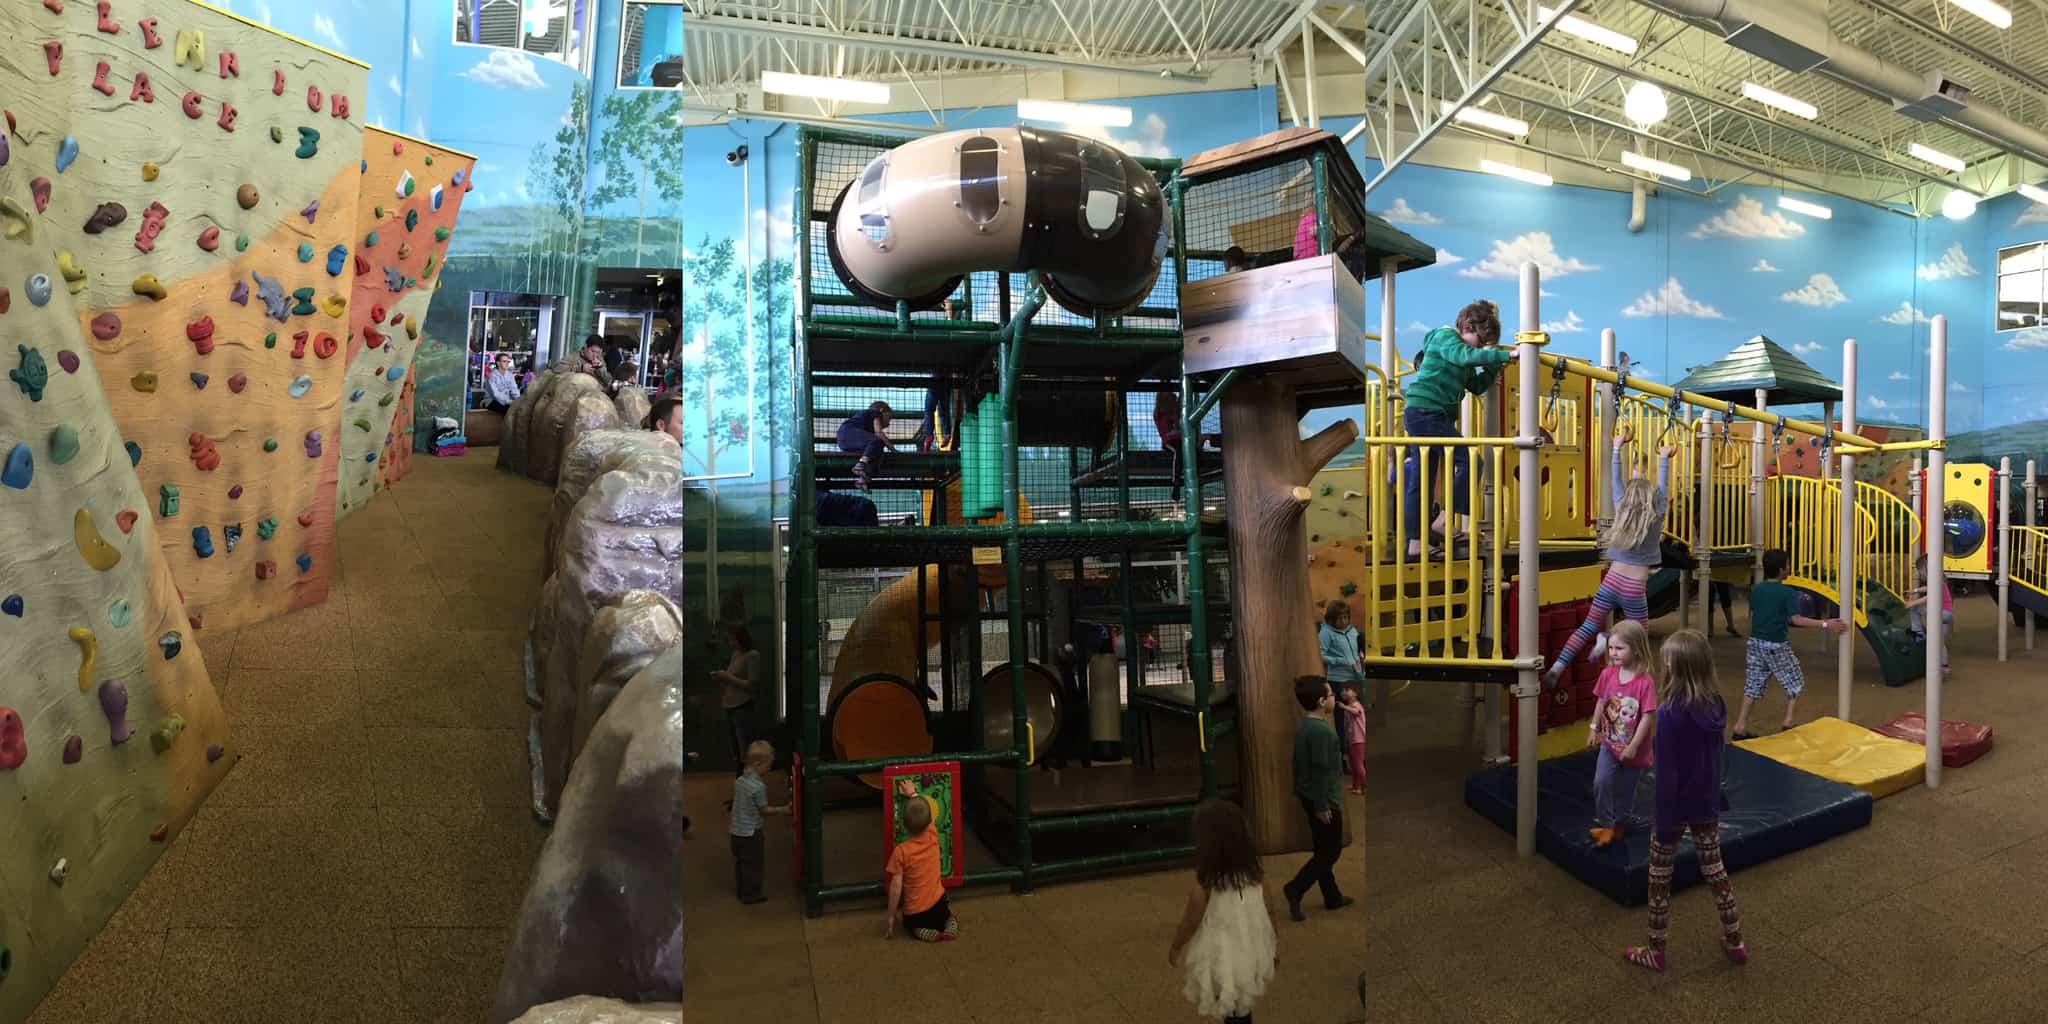 Edmonton Playground Review: Place Shell Edutainment Center